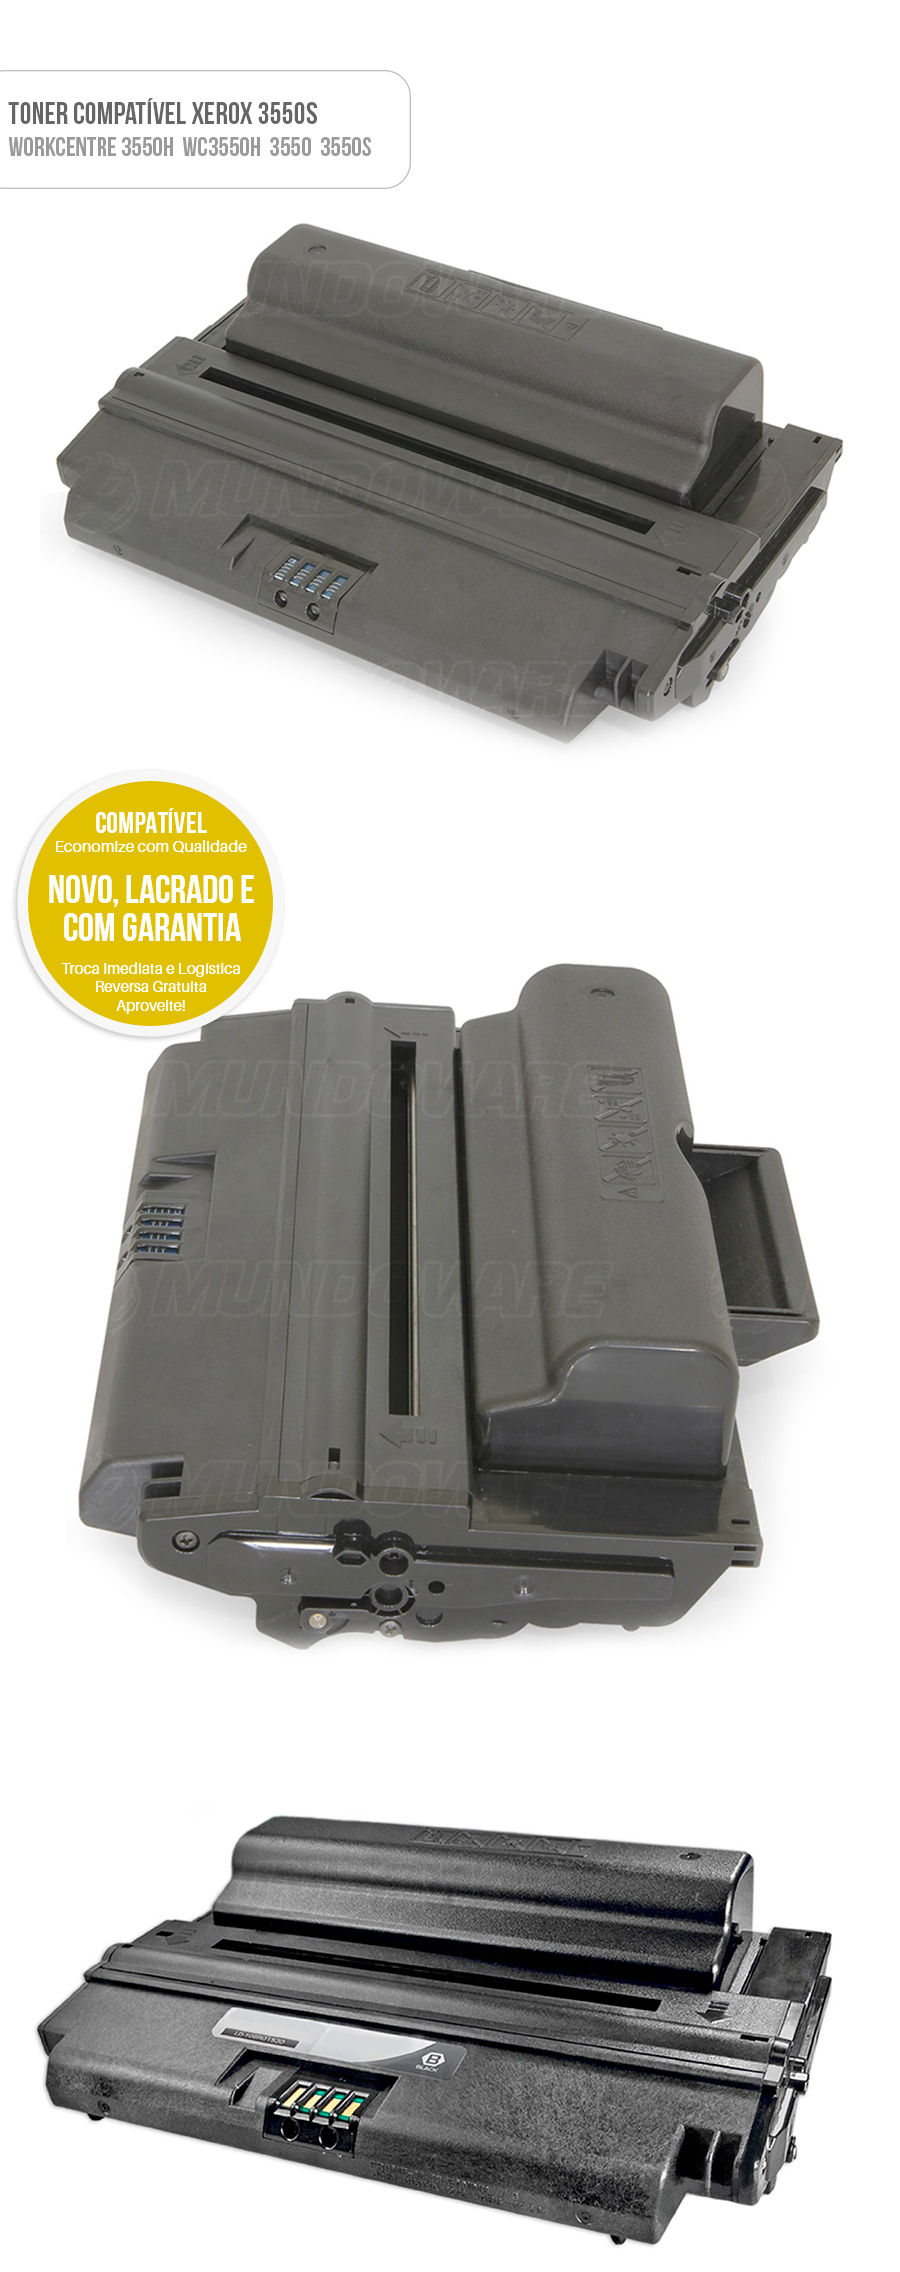 Toner Compatível Xerox 3550S 106R01528 106R01529 Tonner